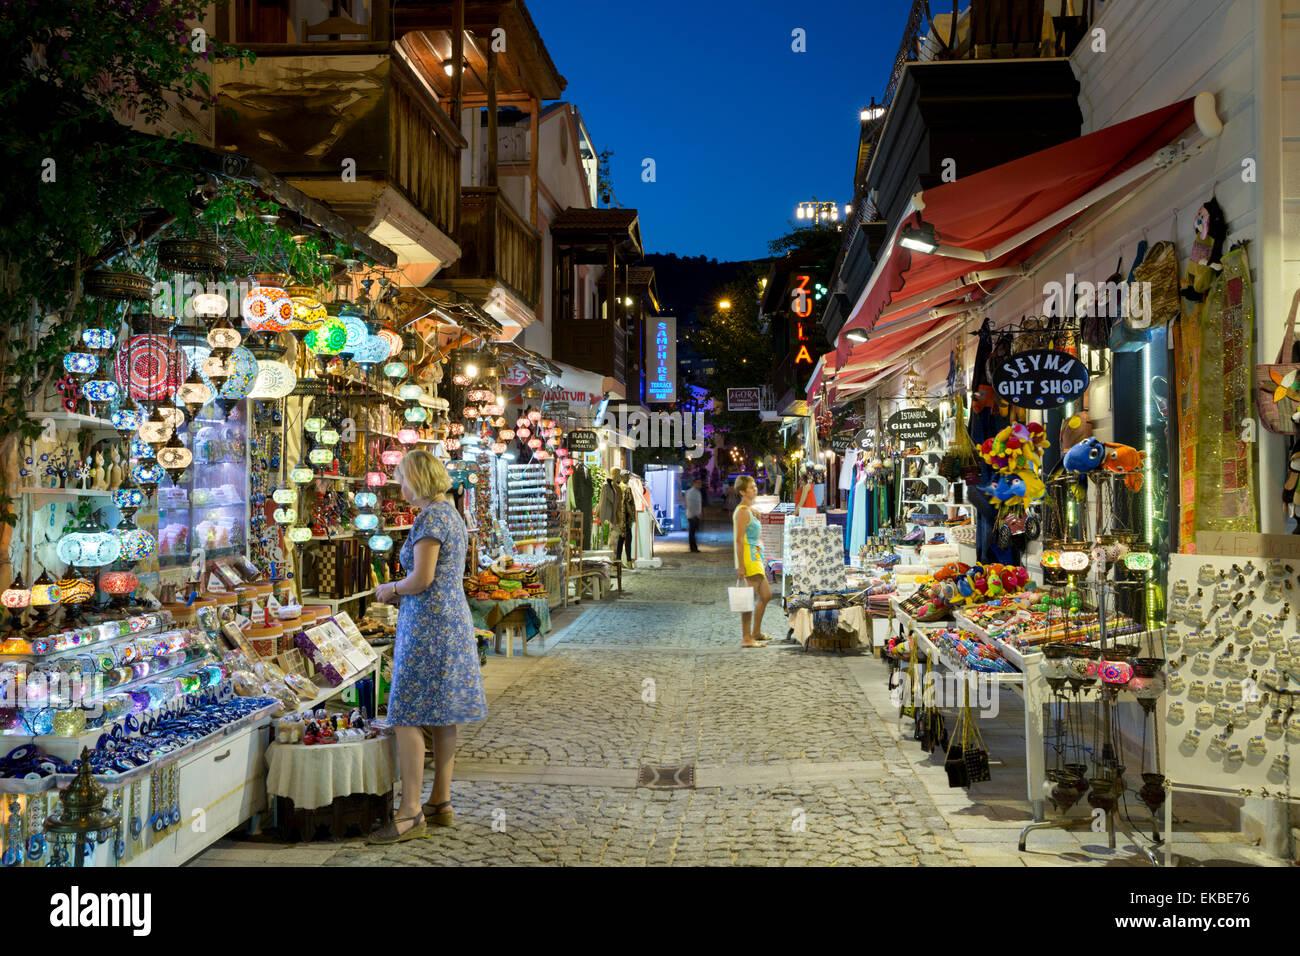 Gift shops at night in the old town, Kalkan, Lycia, Antalya Province Coast, Southwest Turkey, Turkey, Asia Minor, - Stock Image